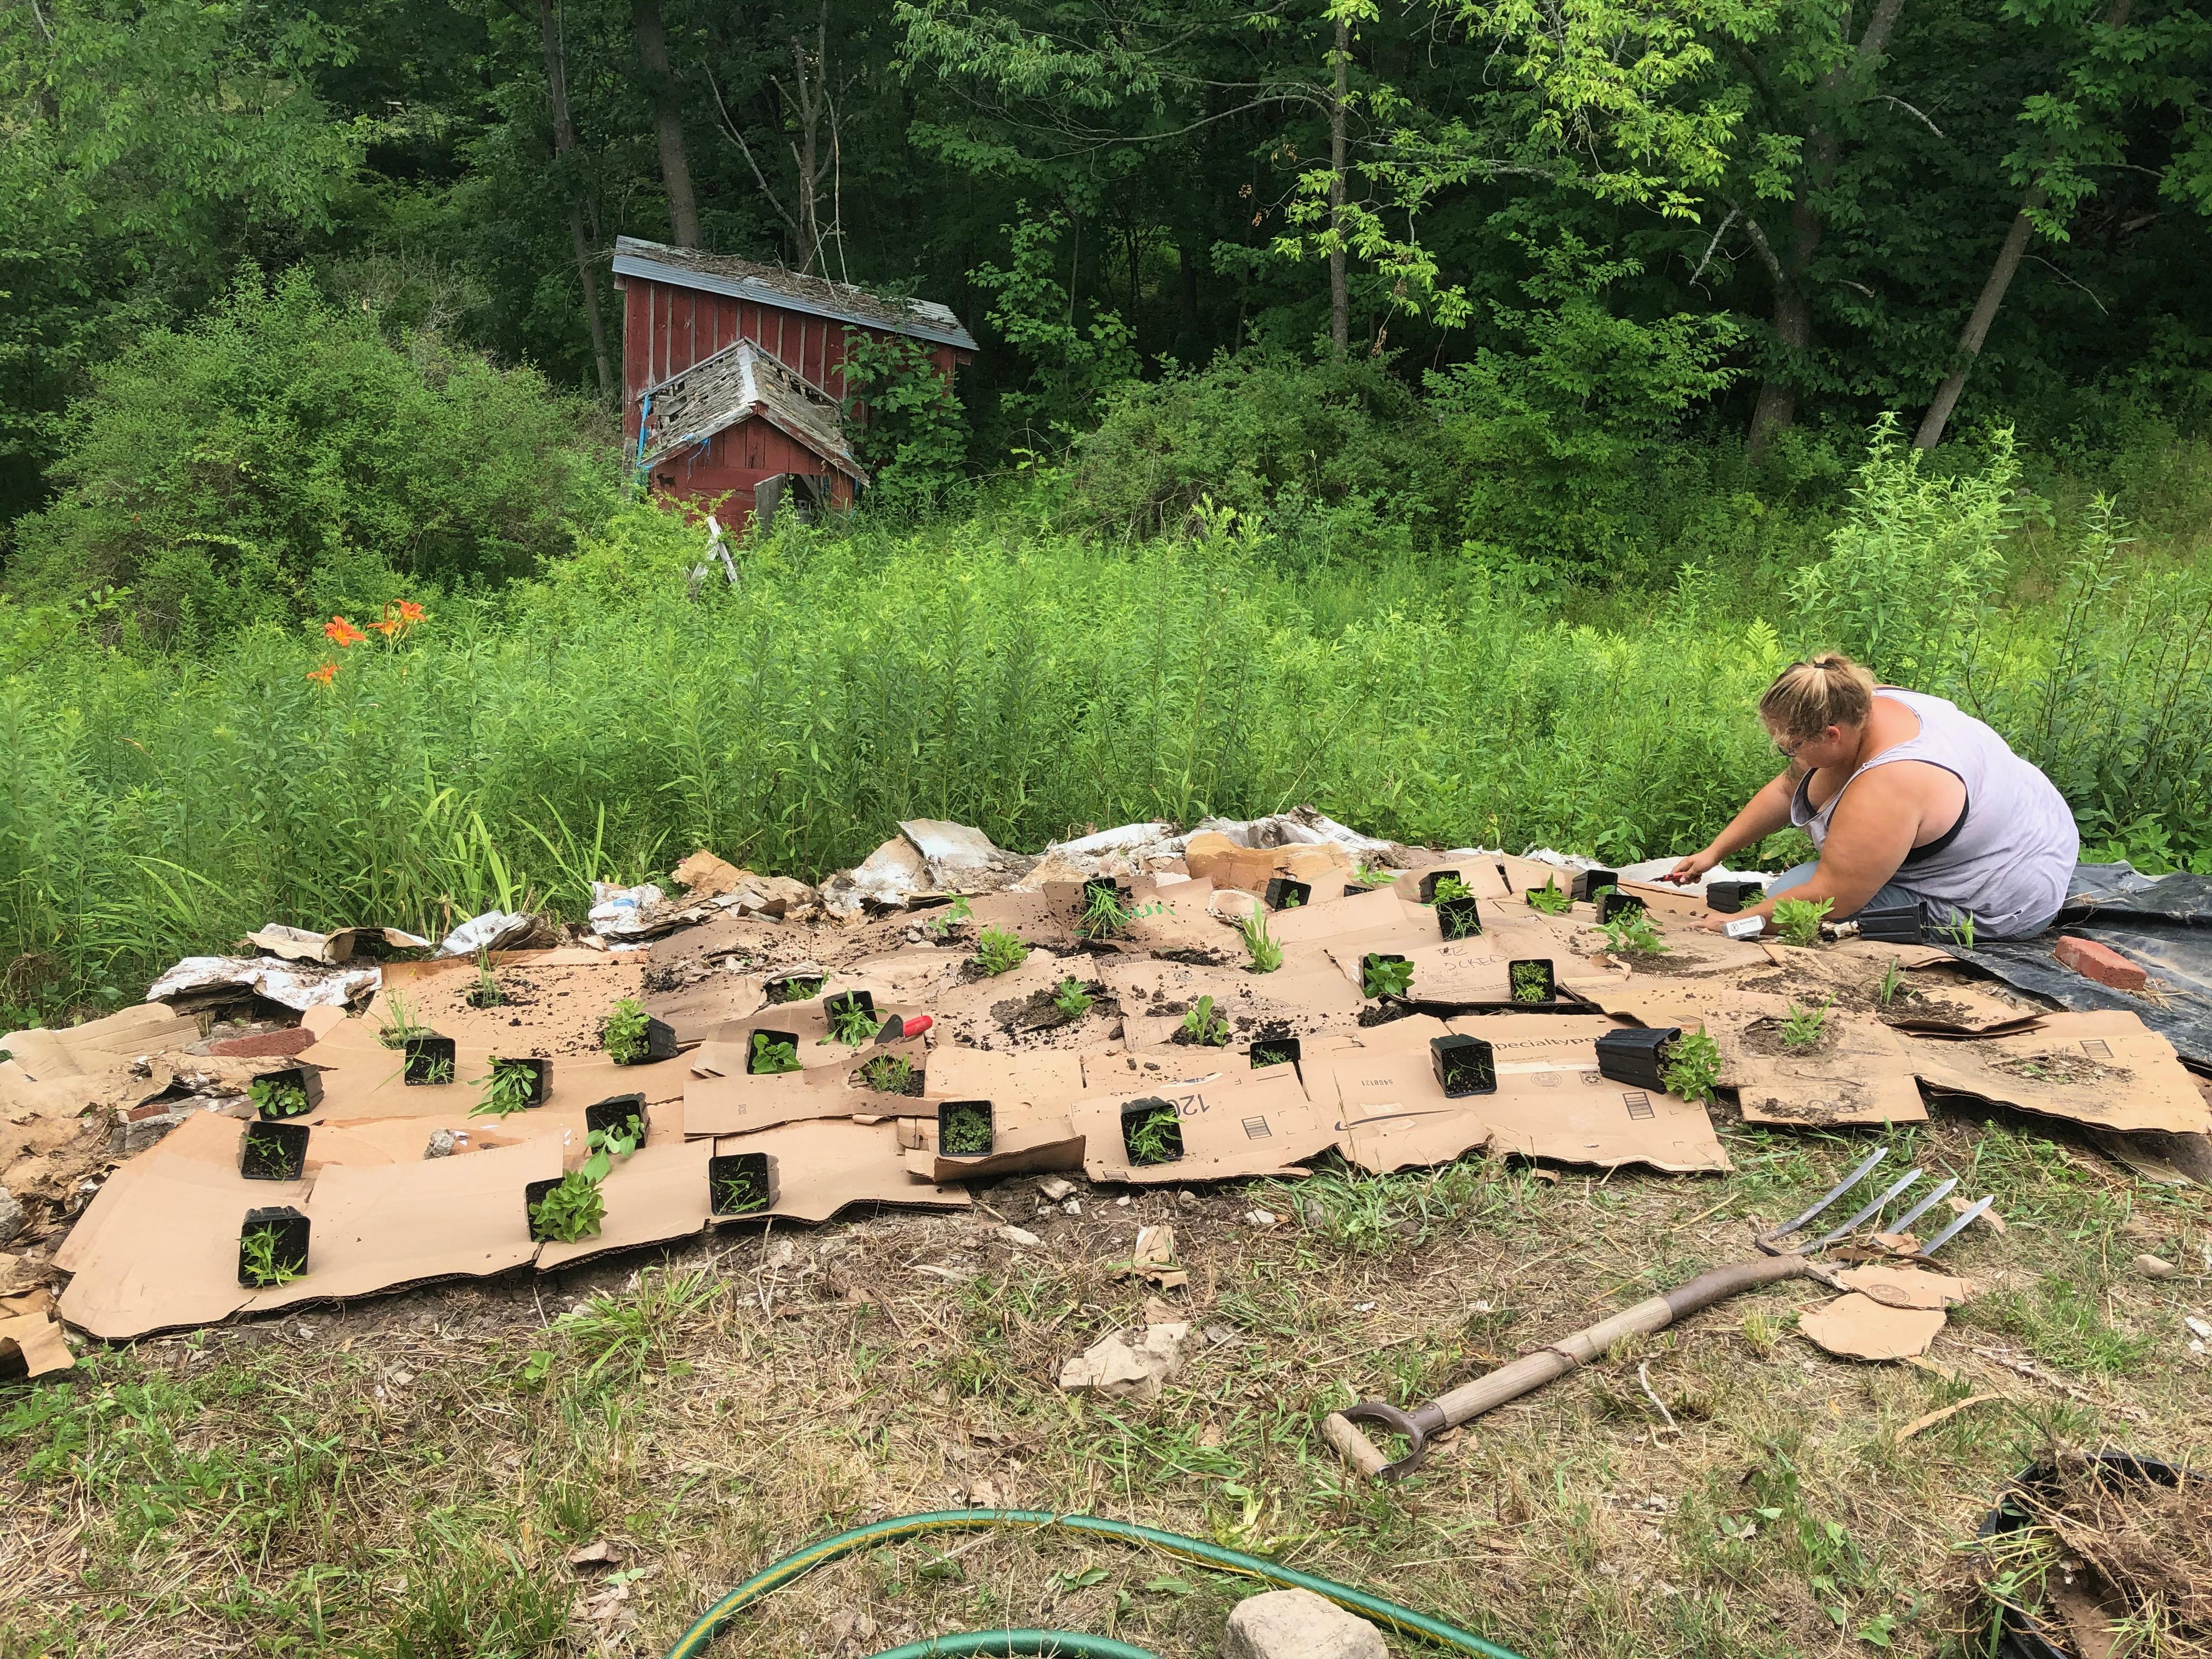 Ellen transplanting plants into holes in the cardboard